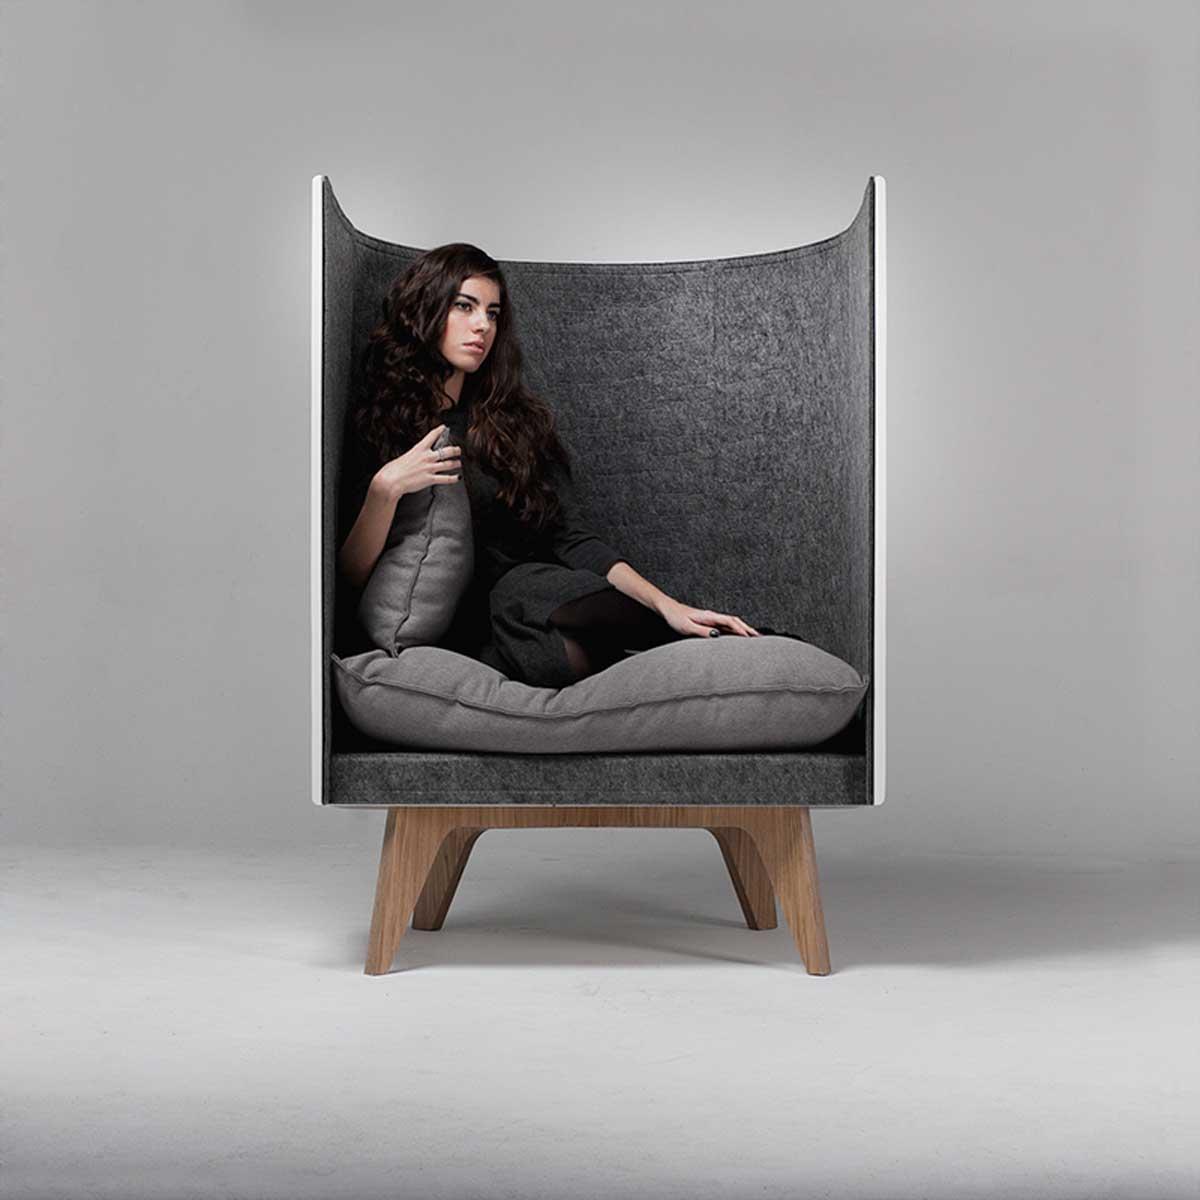 v1_Chair_odesd2_6